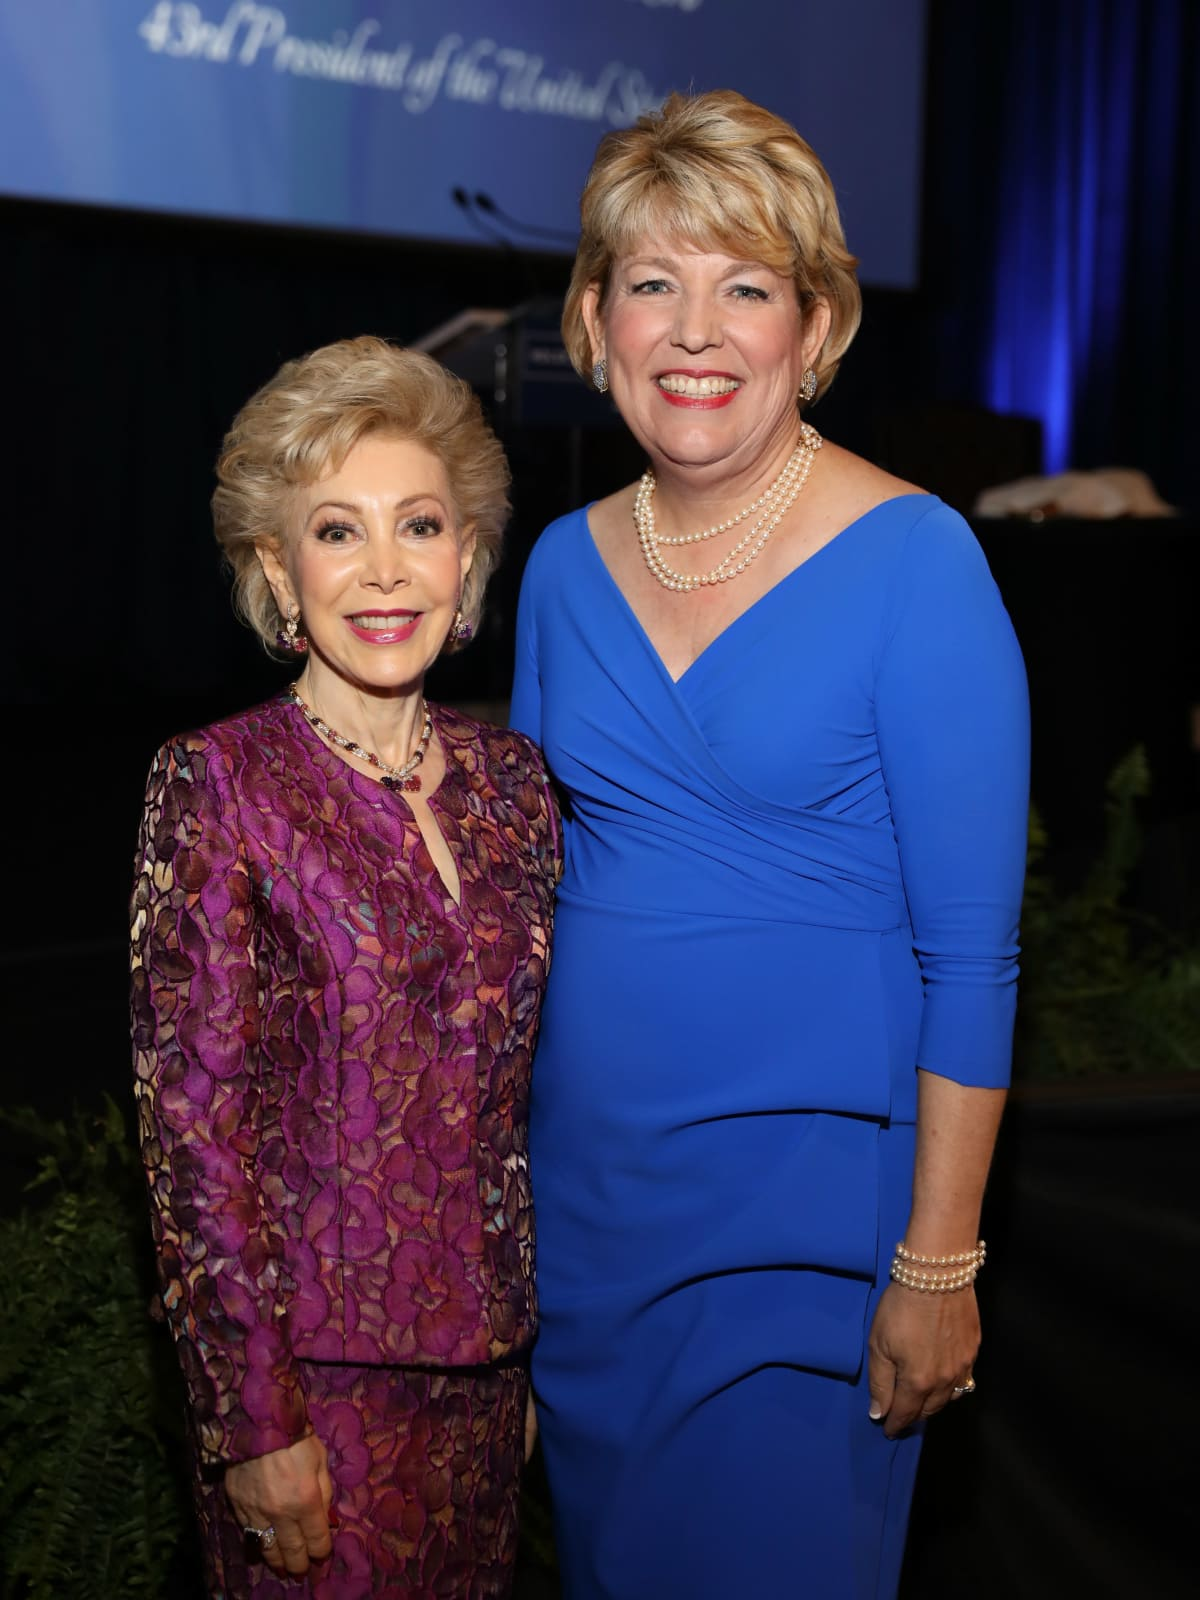 Holocaust Museum LBJ award Margaret Alkek Williams, Dr. Kelly J. Zúñiga, CEO of Holocaust Museum Houston